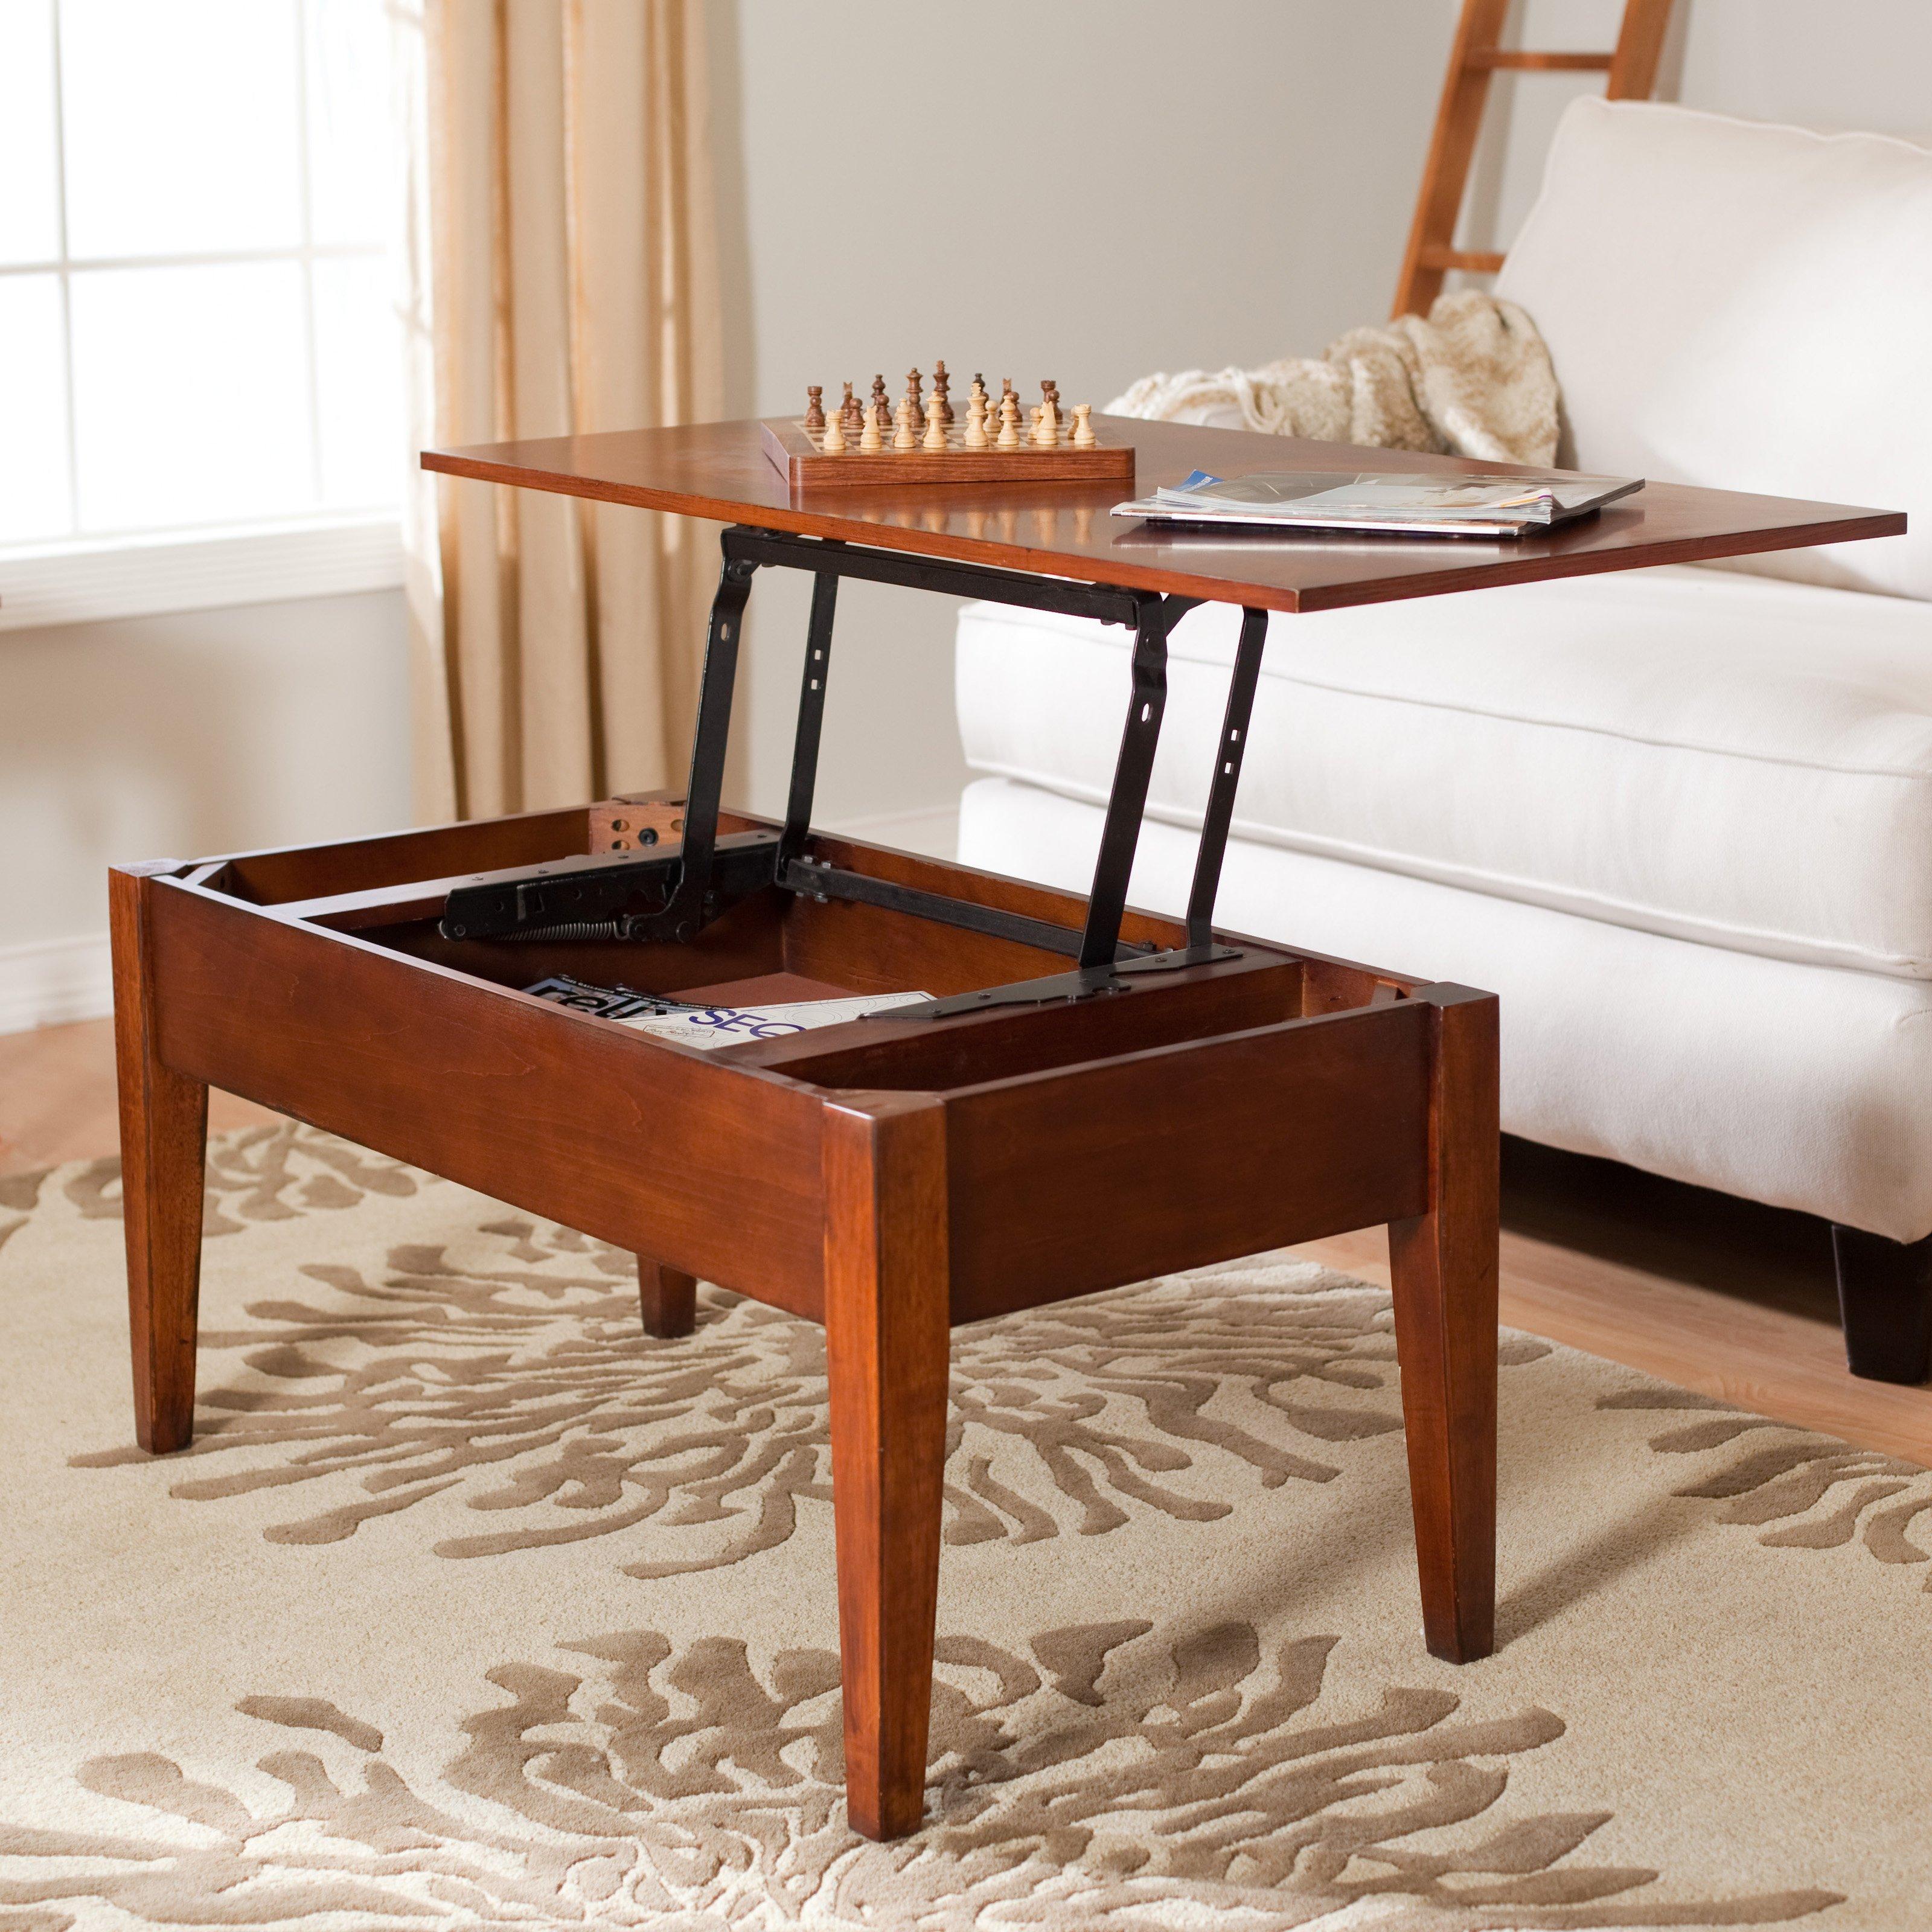 Coffee Table Extendable.Extendable Coffee Table Idea Coffee Tables